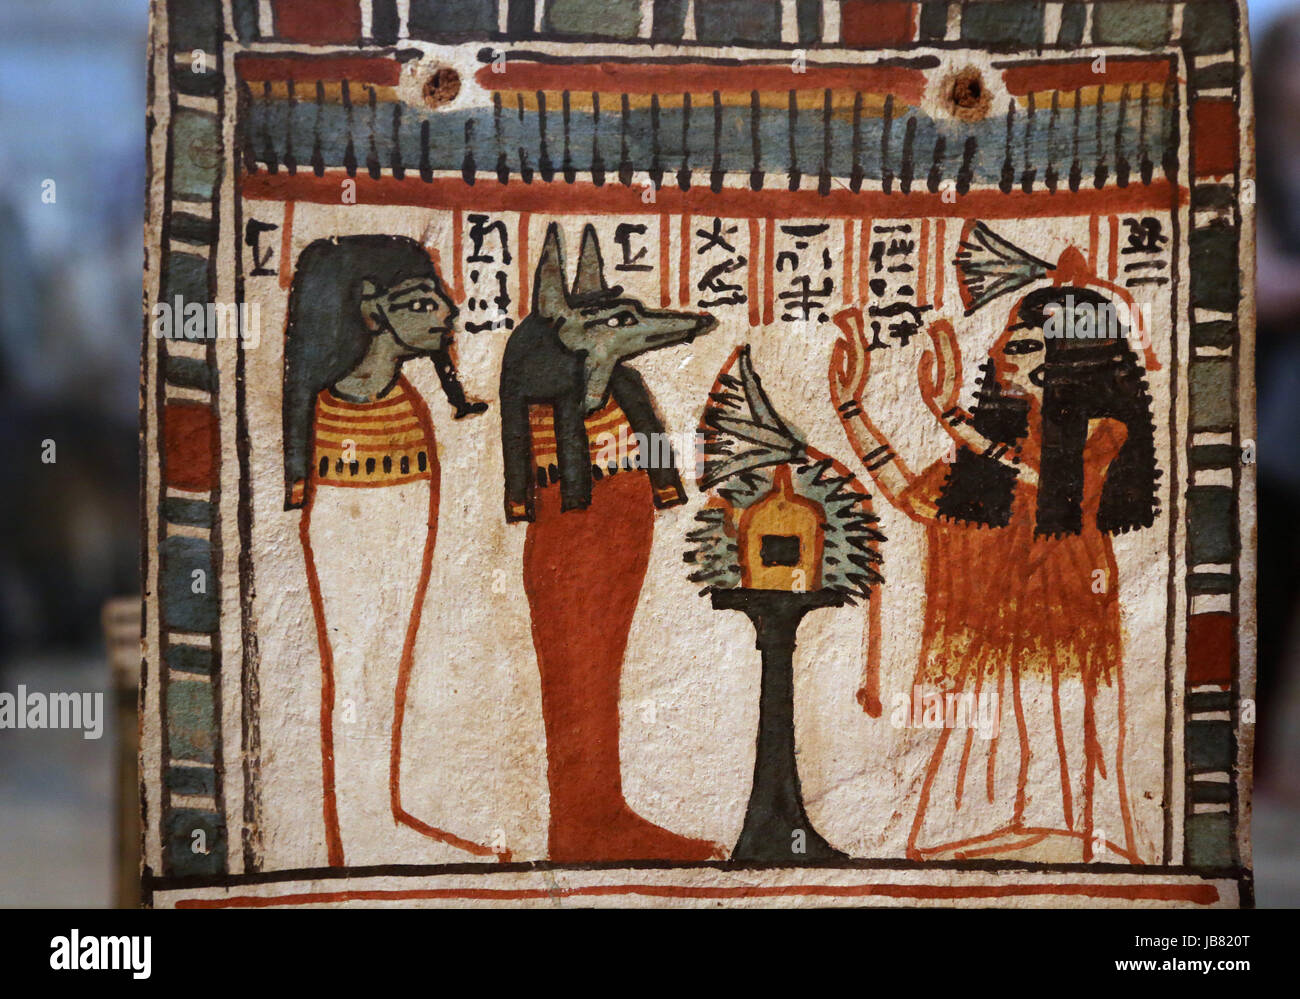 Painting wooden shabti Box. Henutmehyt adoring mummiform figures. 19th Dynasty. Thebes. British Museum. London. - Stock Image